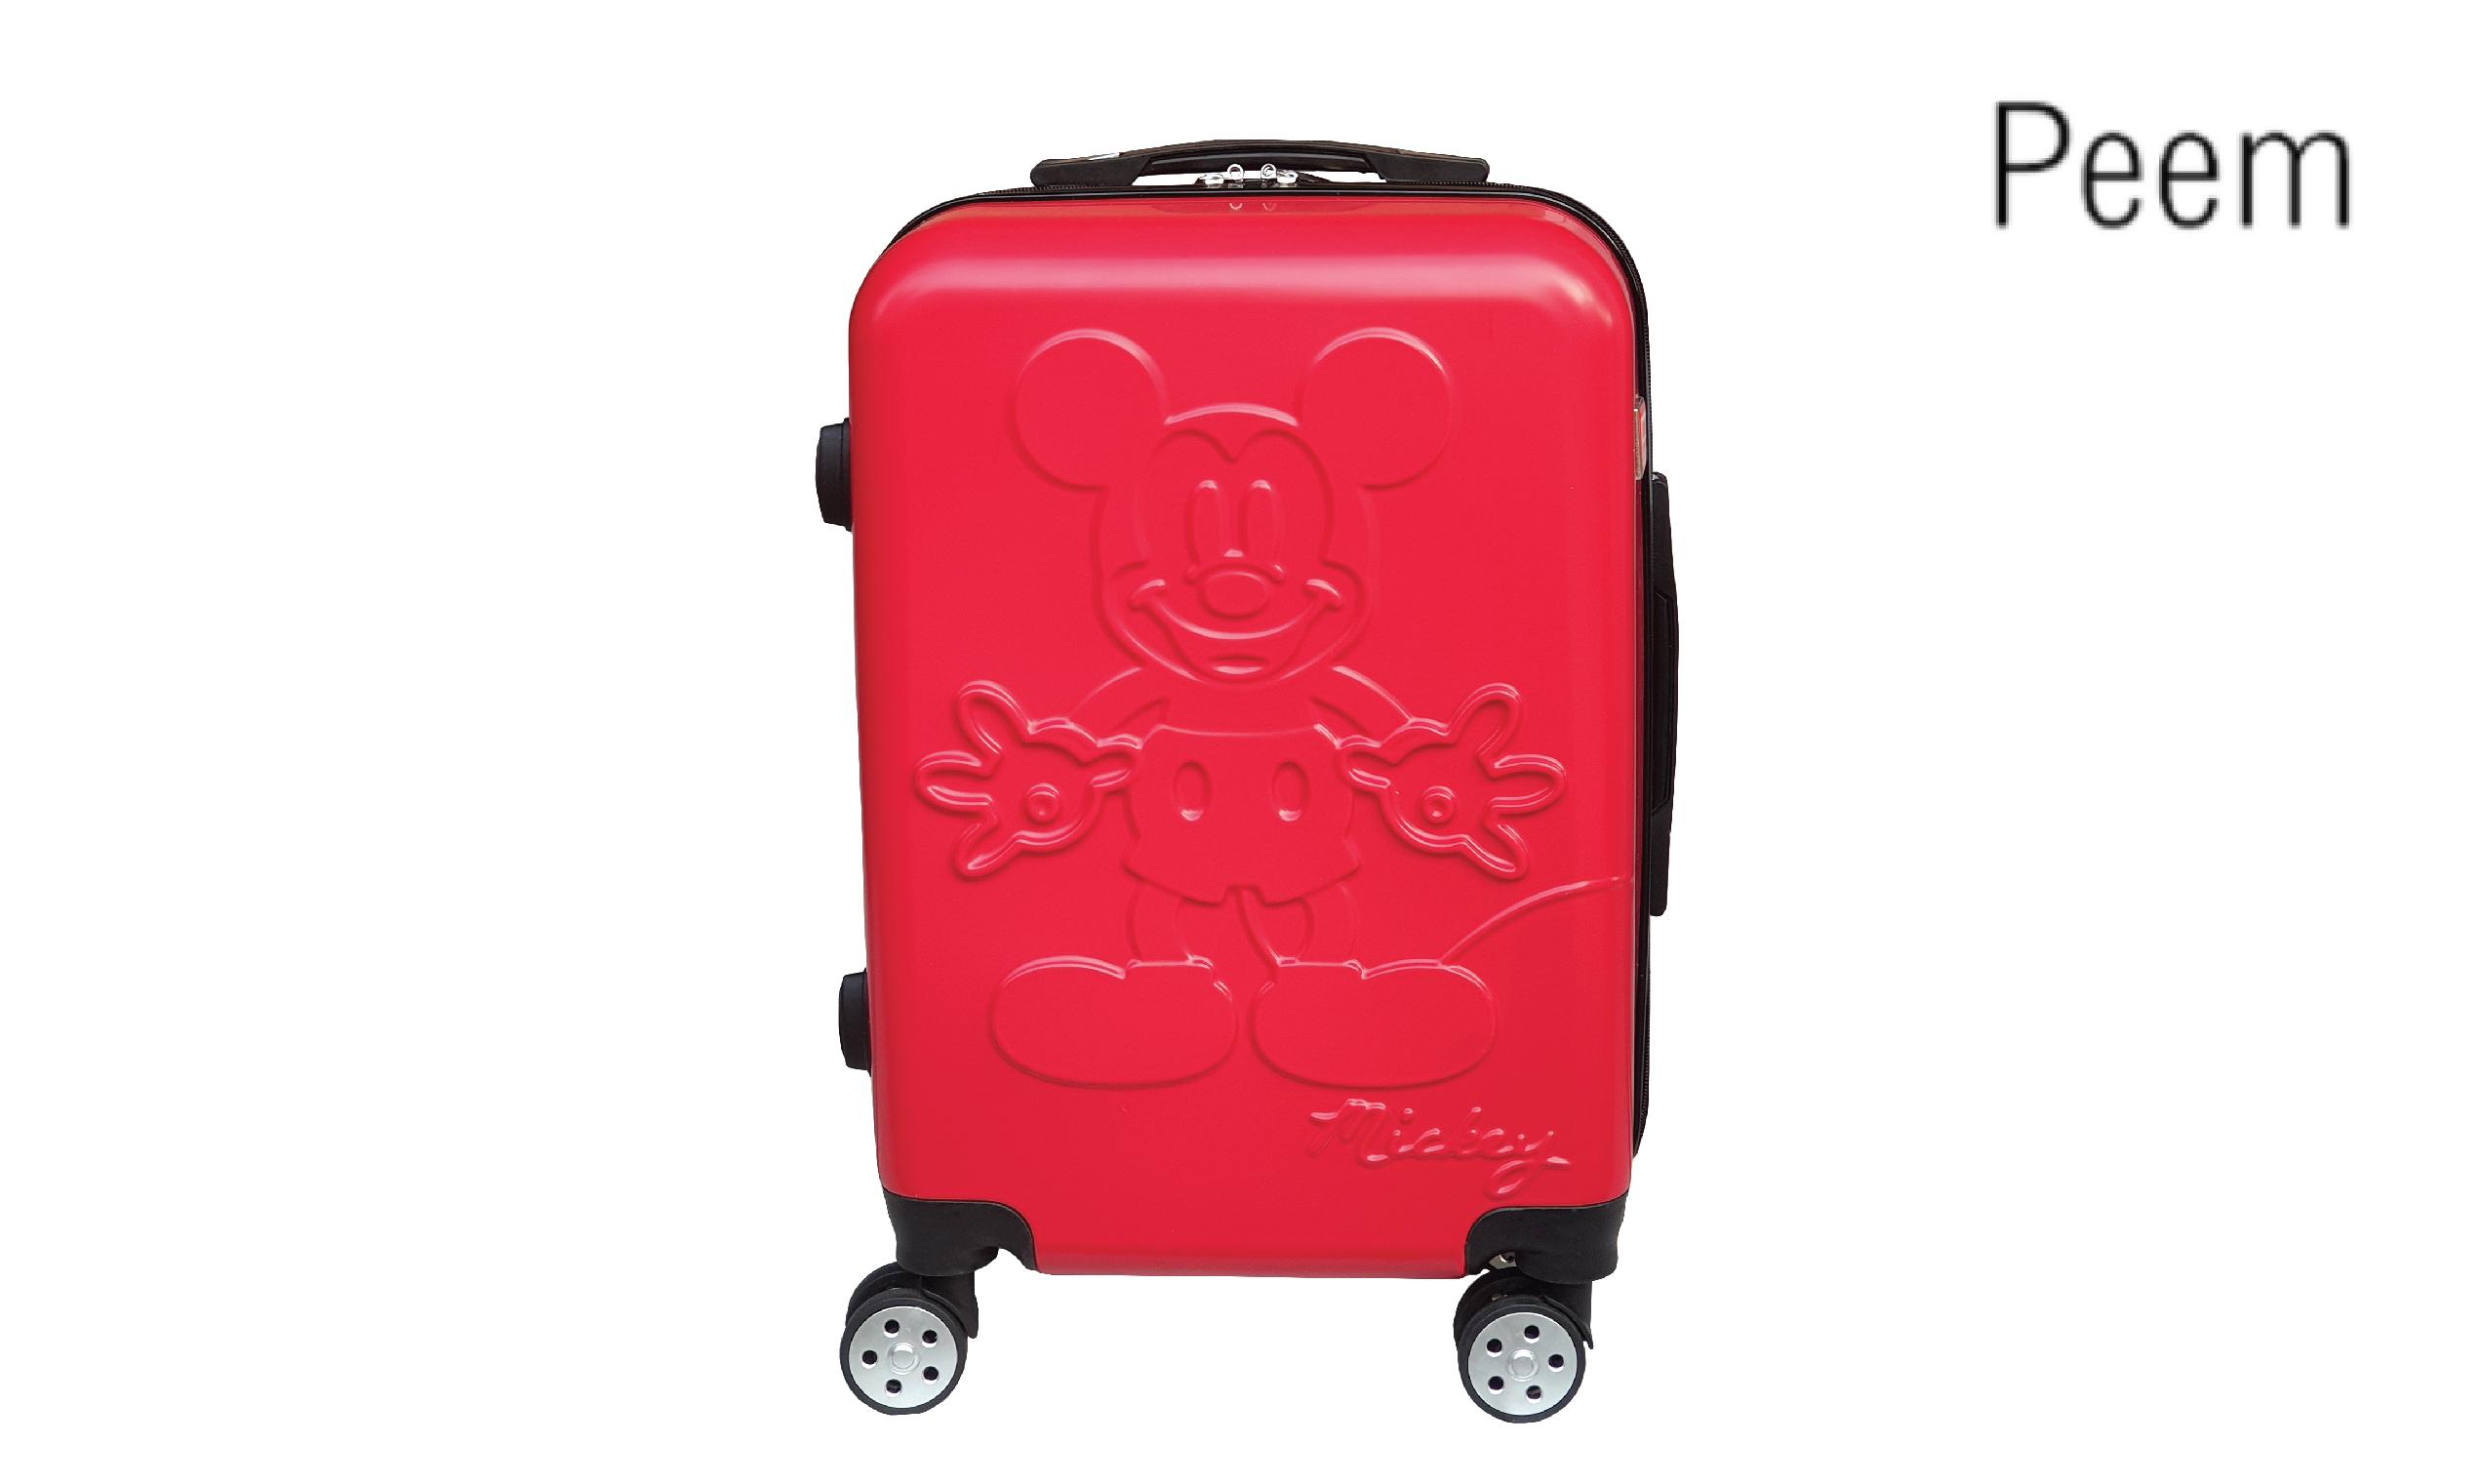 Peem PDNY004RD กระเป๋าเดินทาง 20 นิ้ว ลาย Mickey Mouse สีแดง